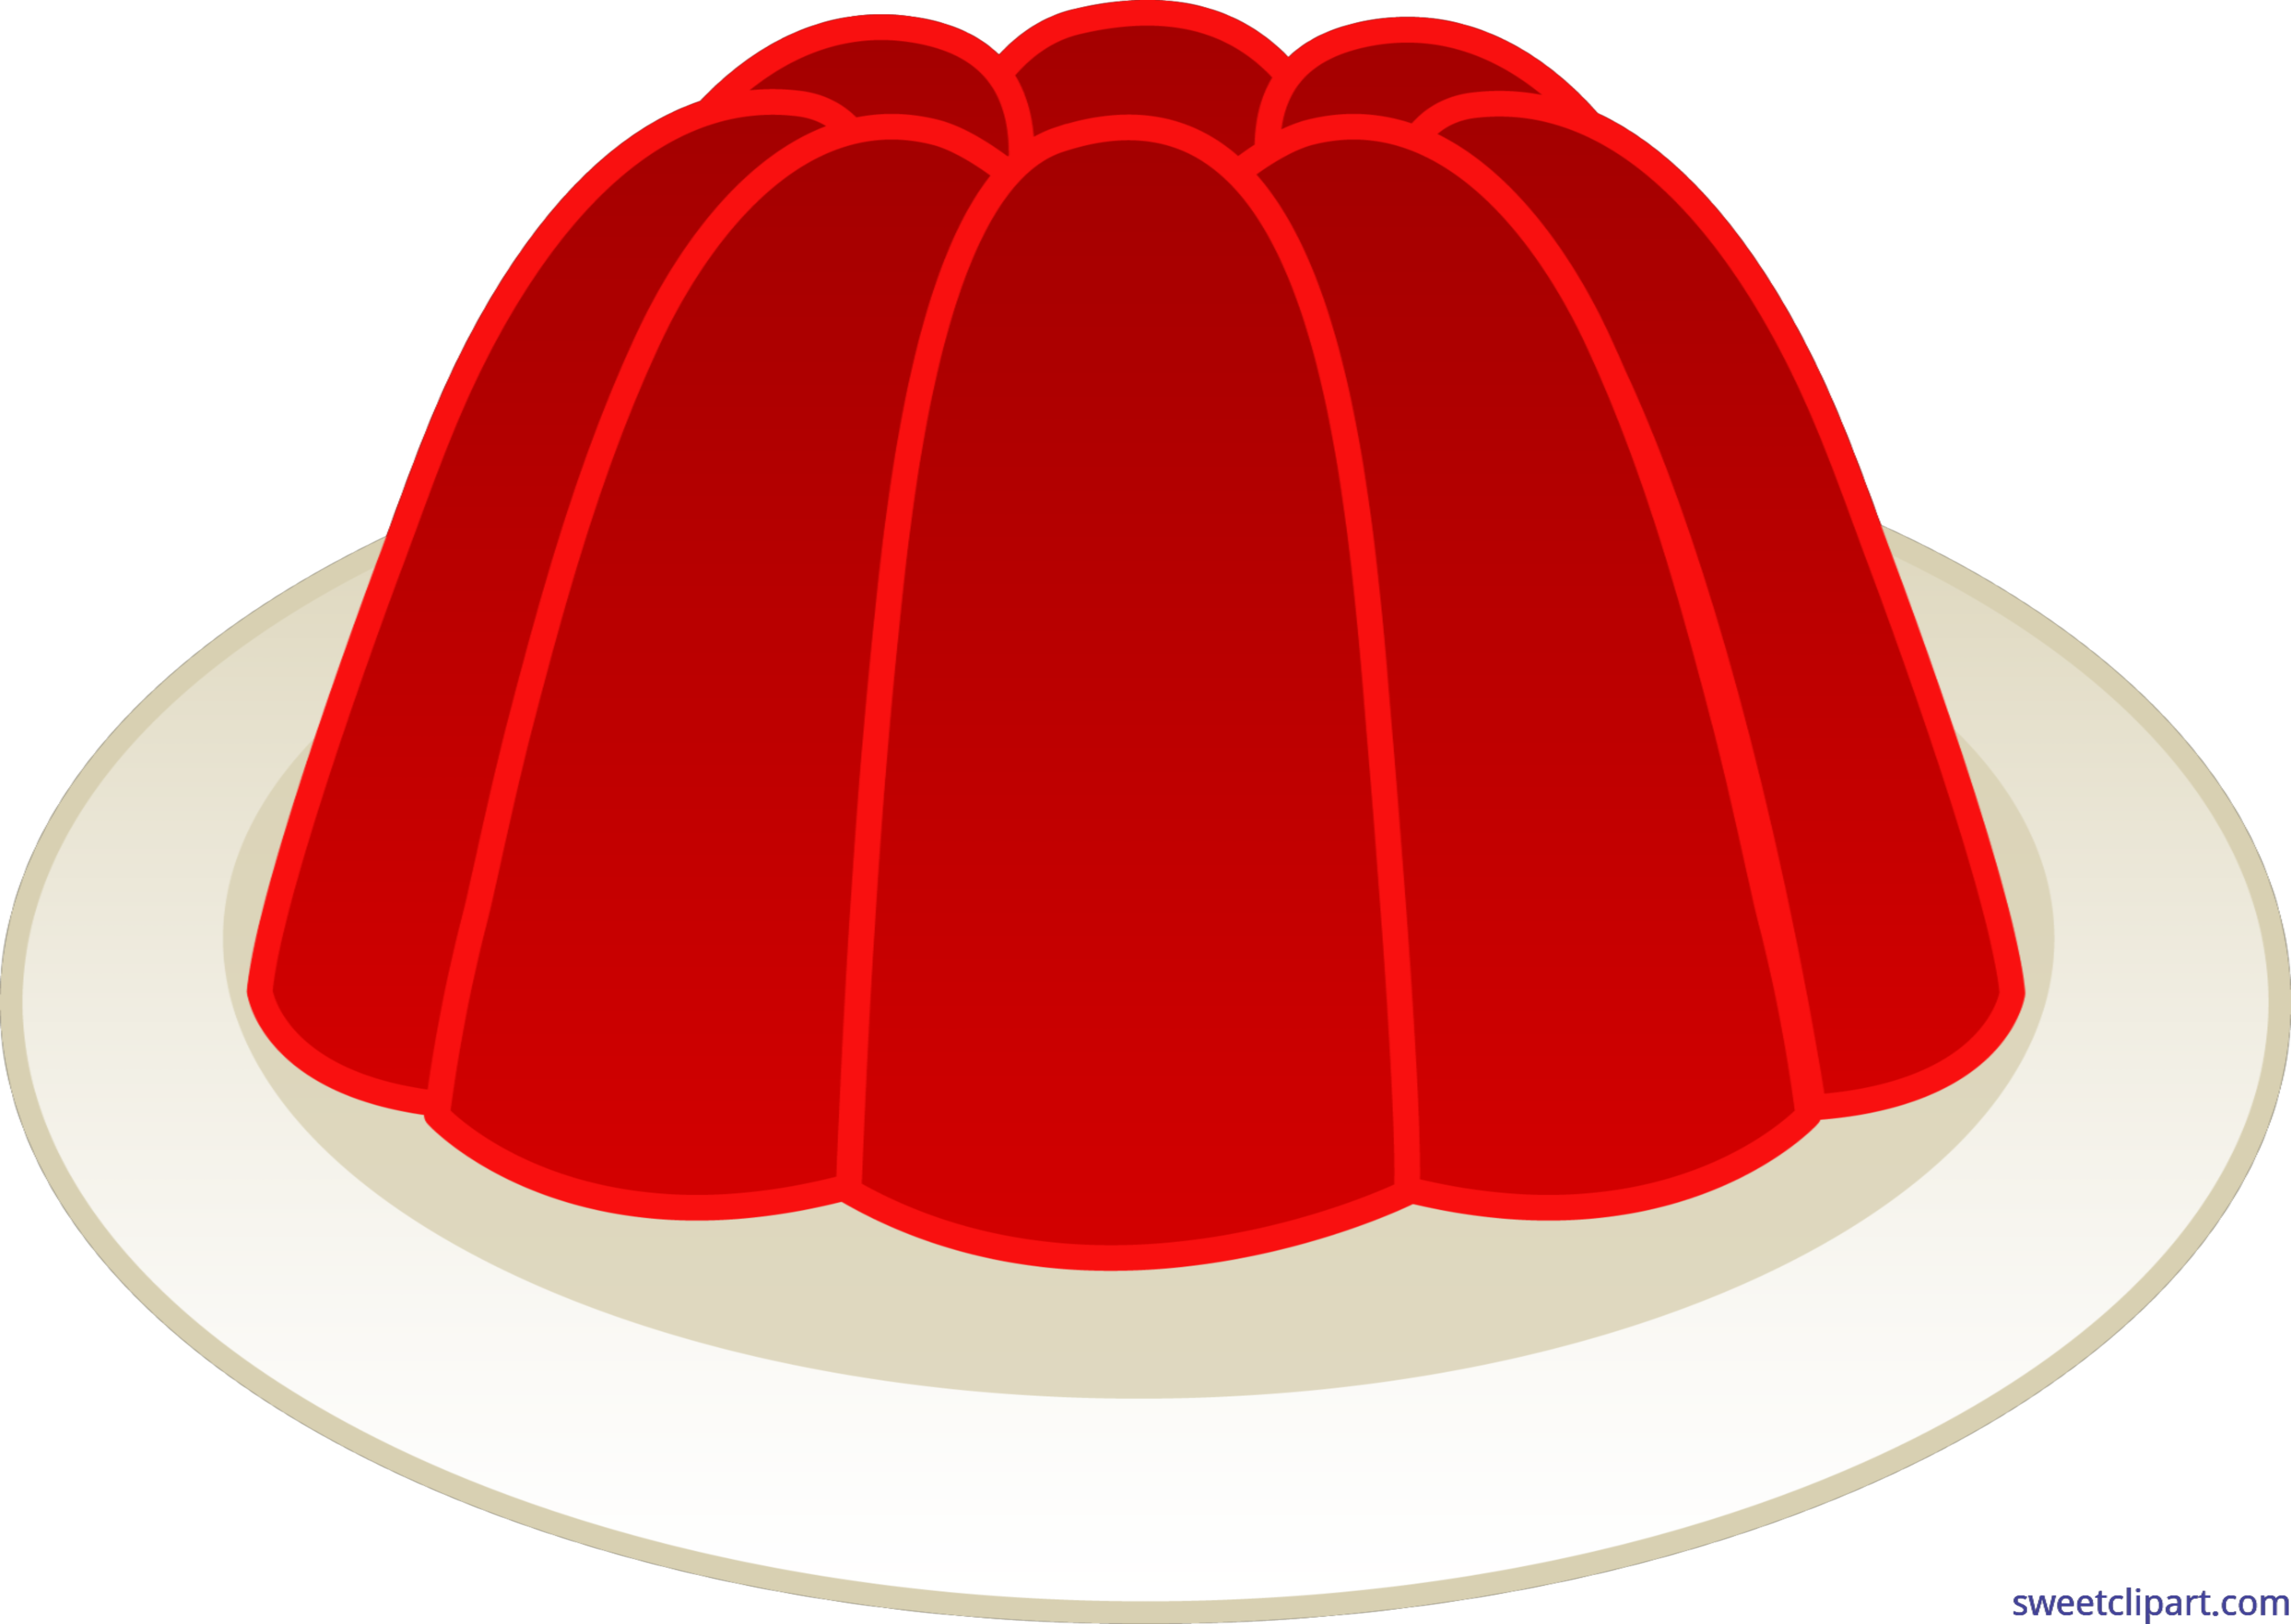 image black and white download Yellow clipart jello. Dessert free on dumielauxepices